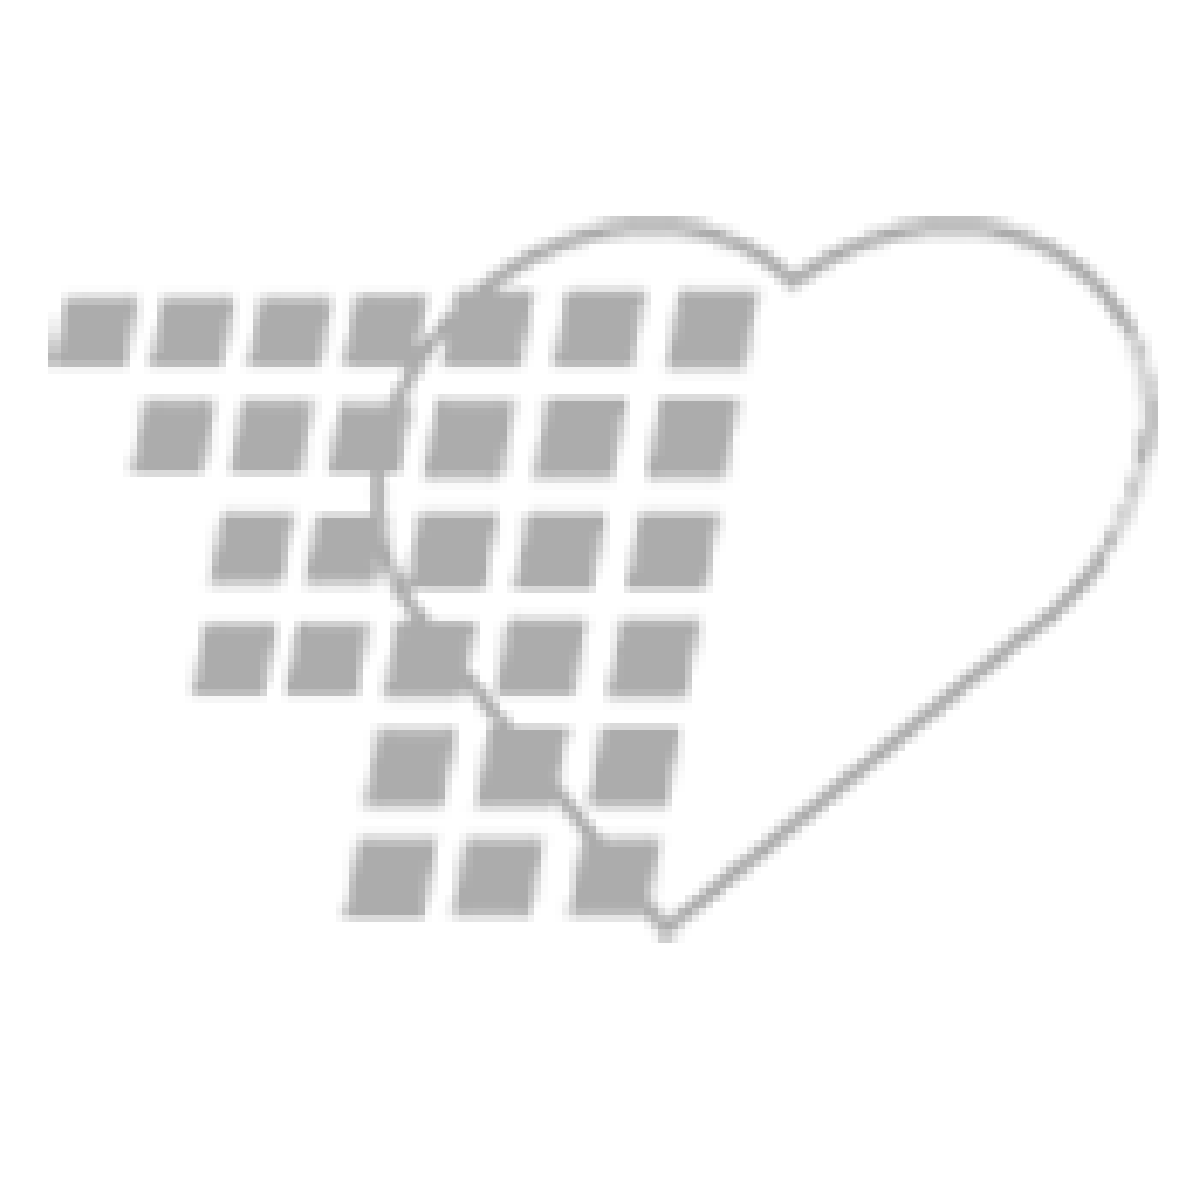 06-93-1202 - Demo Dose® Amoxicilln Clavulanc acd Augmentn 100 mL 400 mg/5 mL